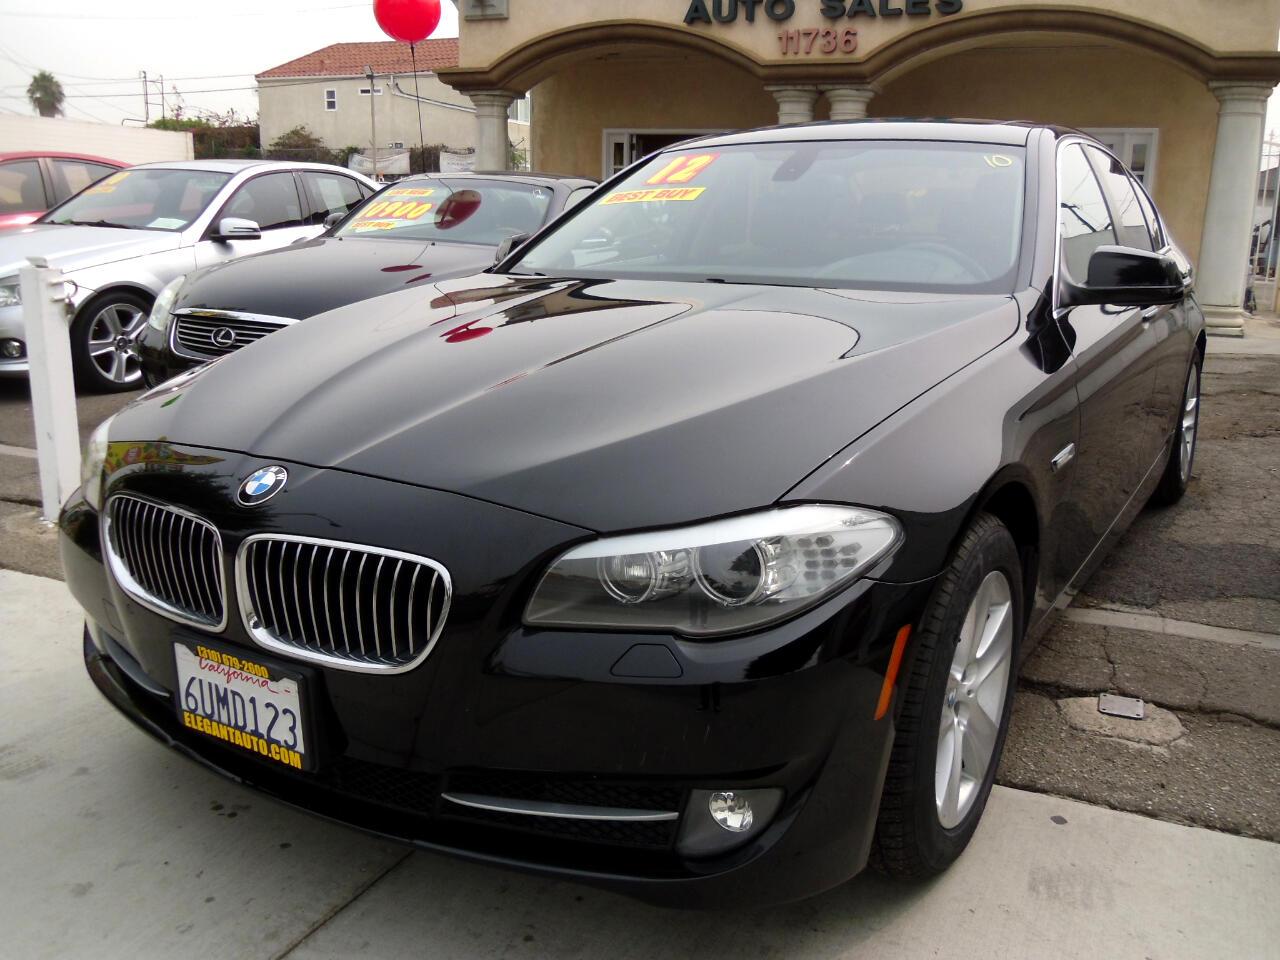 BMW 5 Series 4dr Sdn 528i RWD 2012